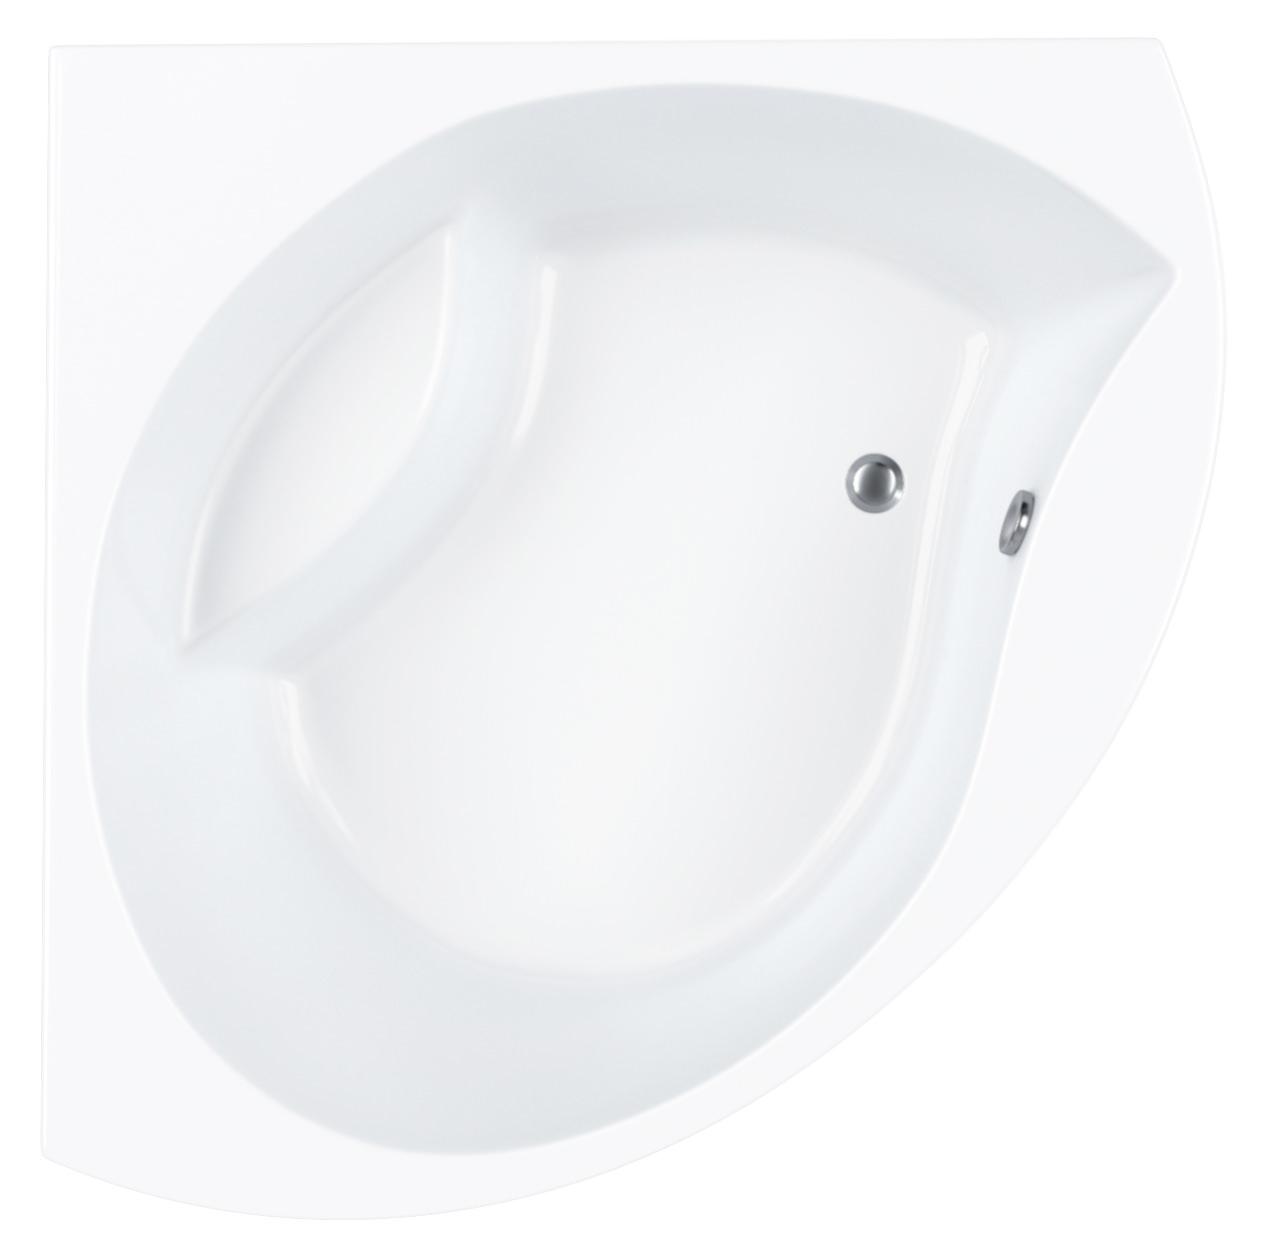 Carron tranquility 5mm acrylic corner bath 1300 x 1300mm for Small baths 1300